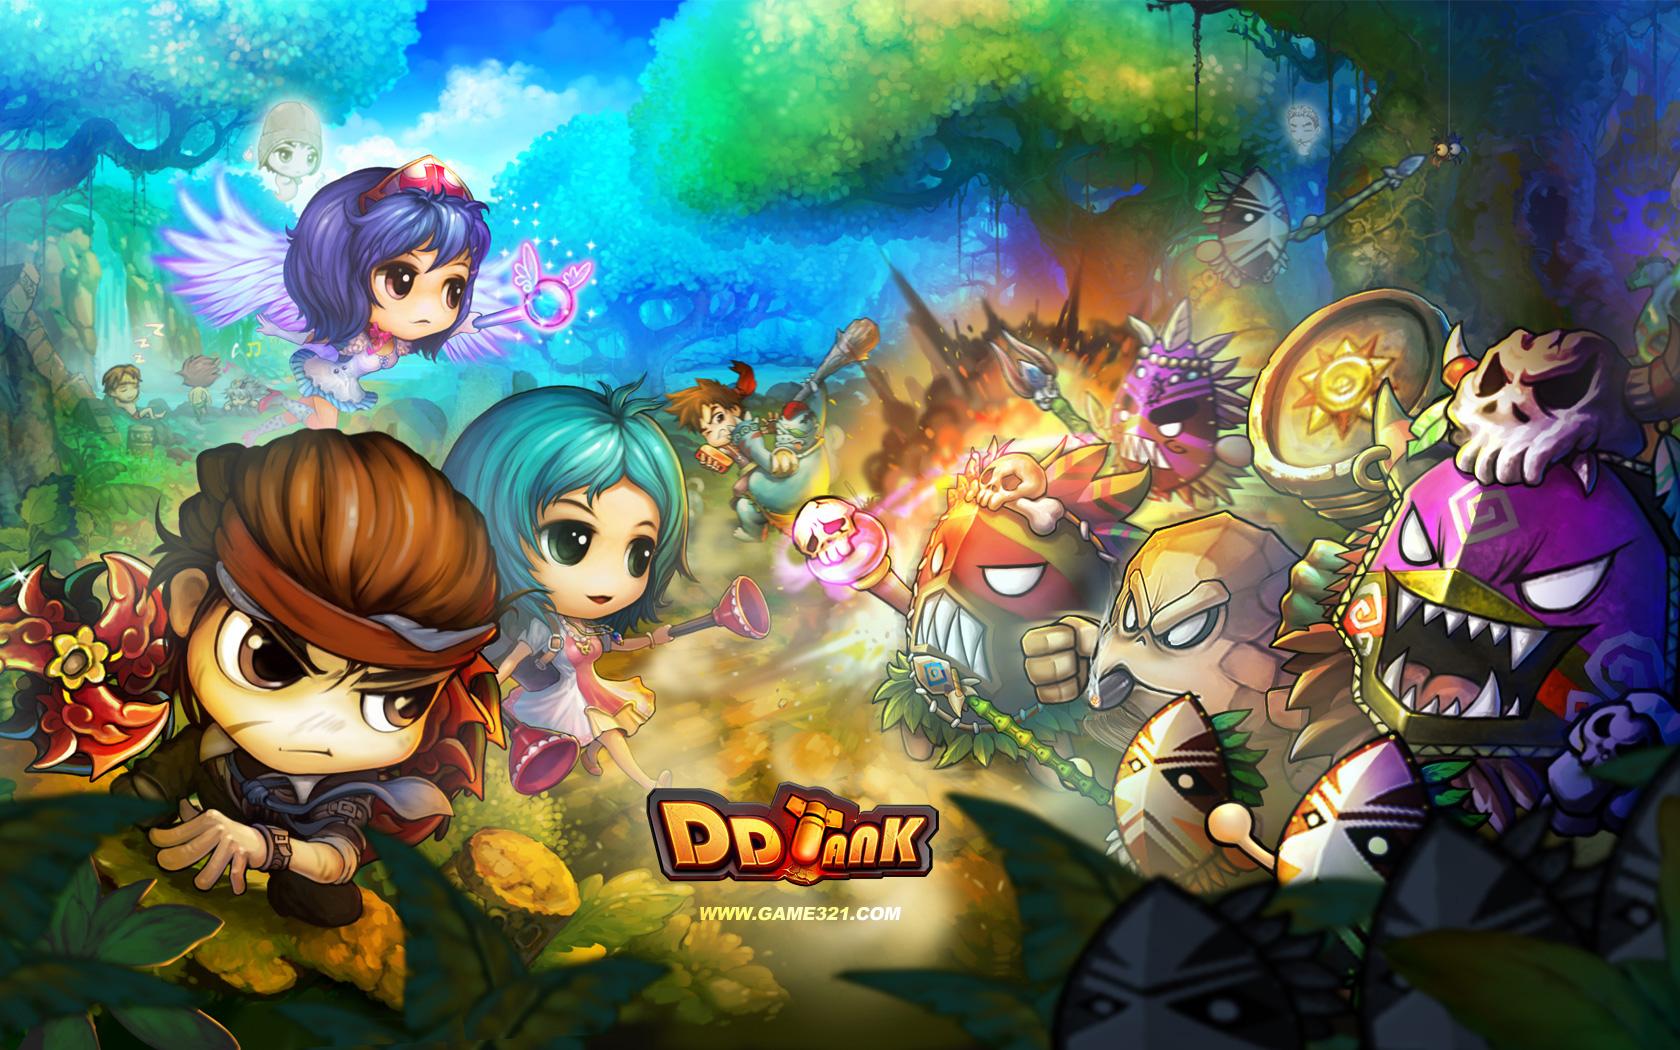 DDtank Pics, Video Game Collection